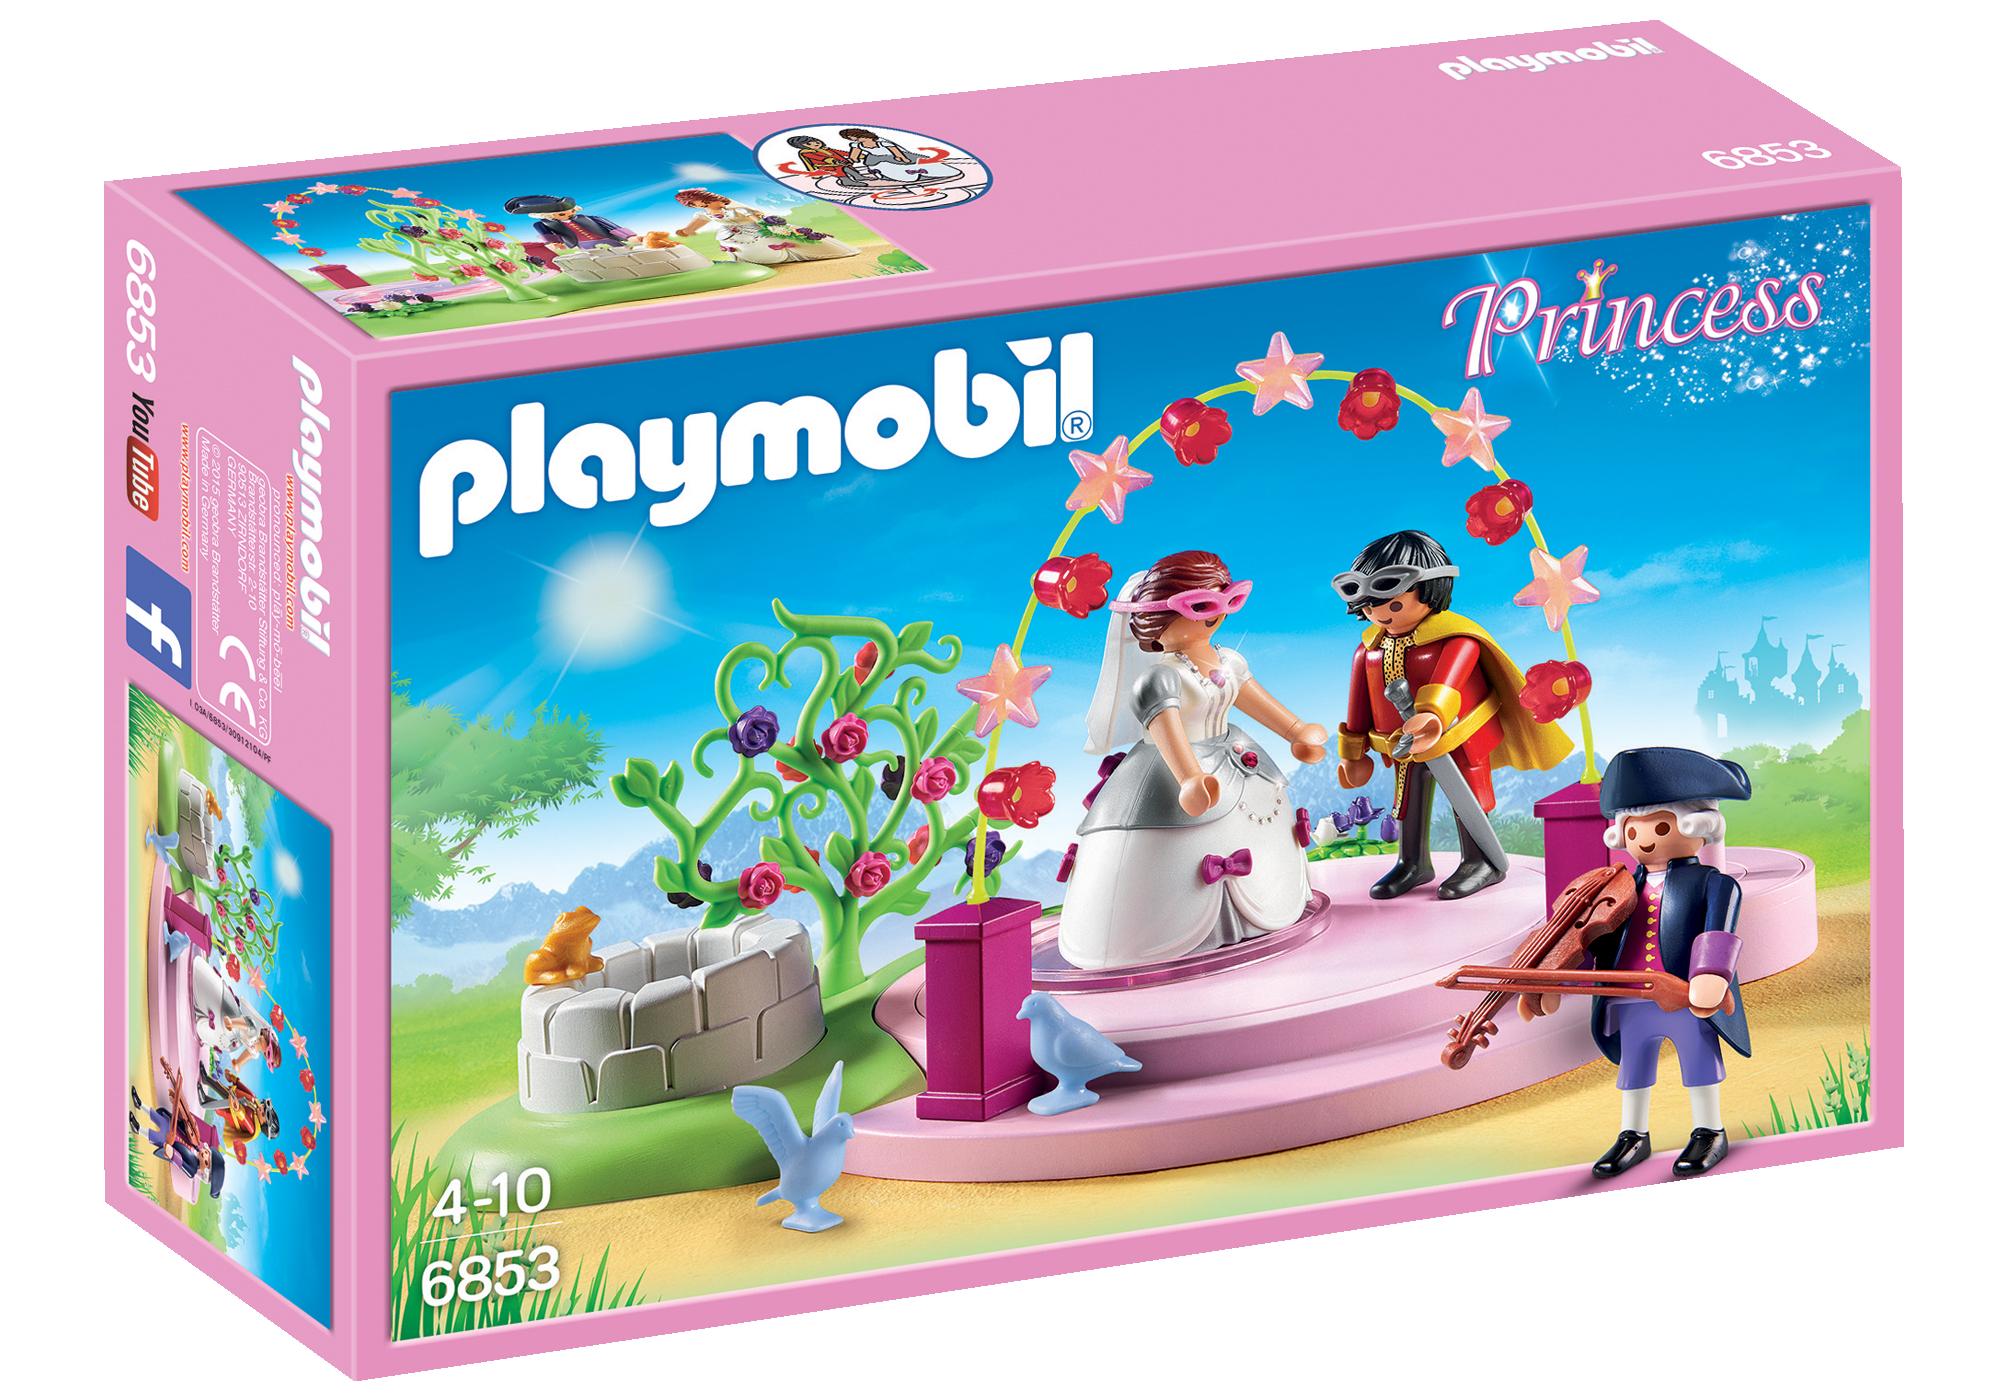 http://media.playmobil.com/i/playmobil/6853_product_box_front